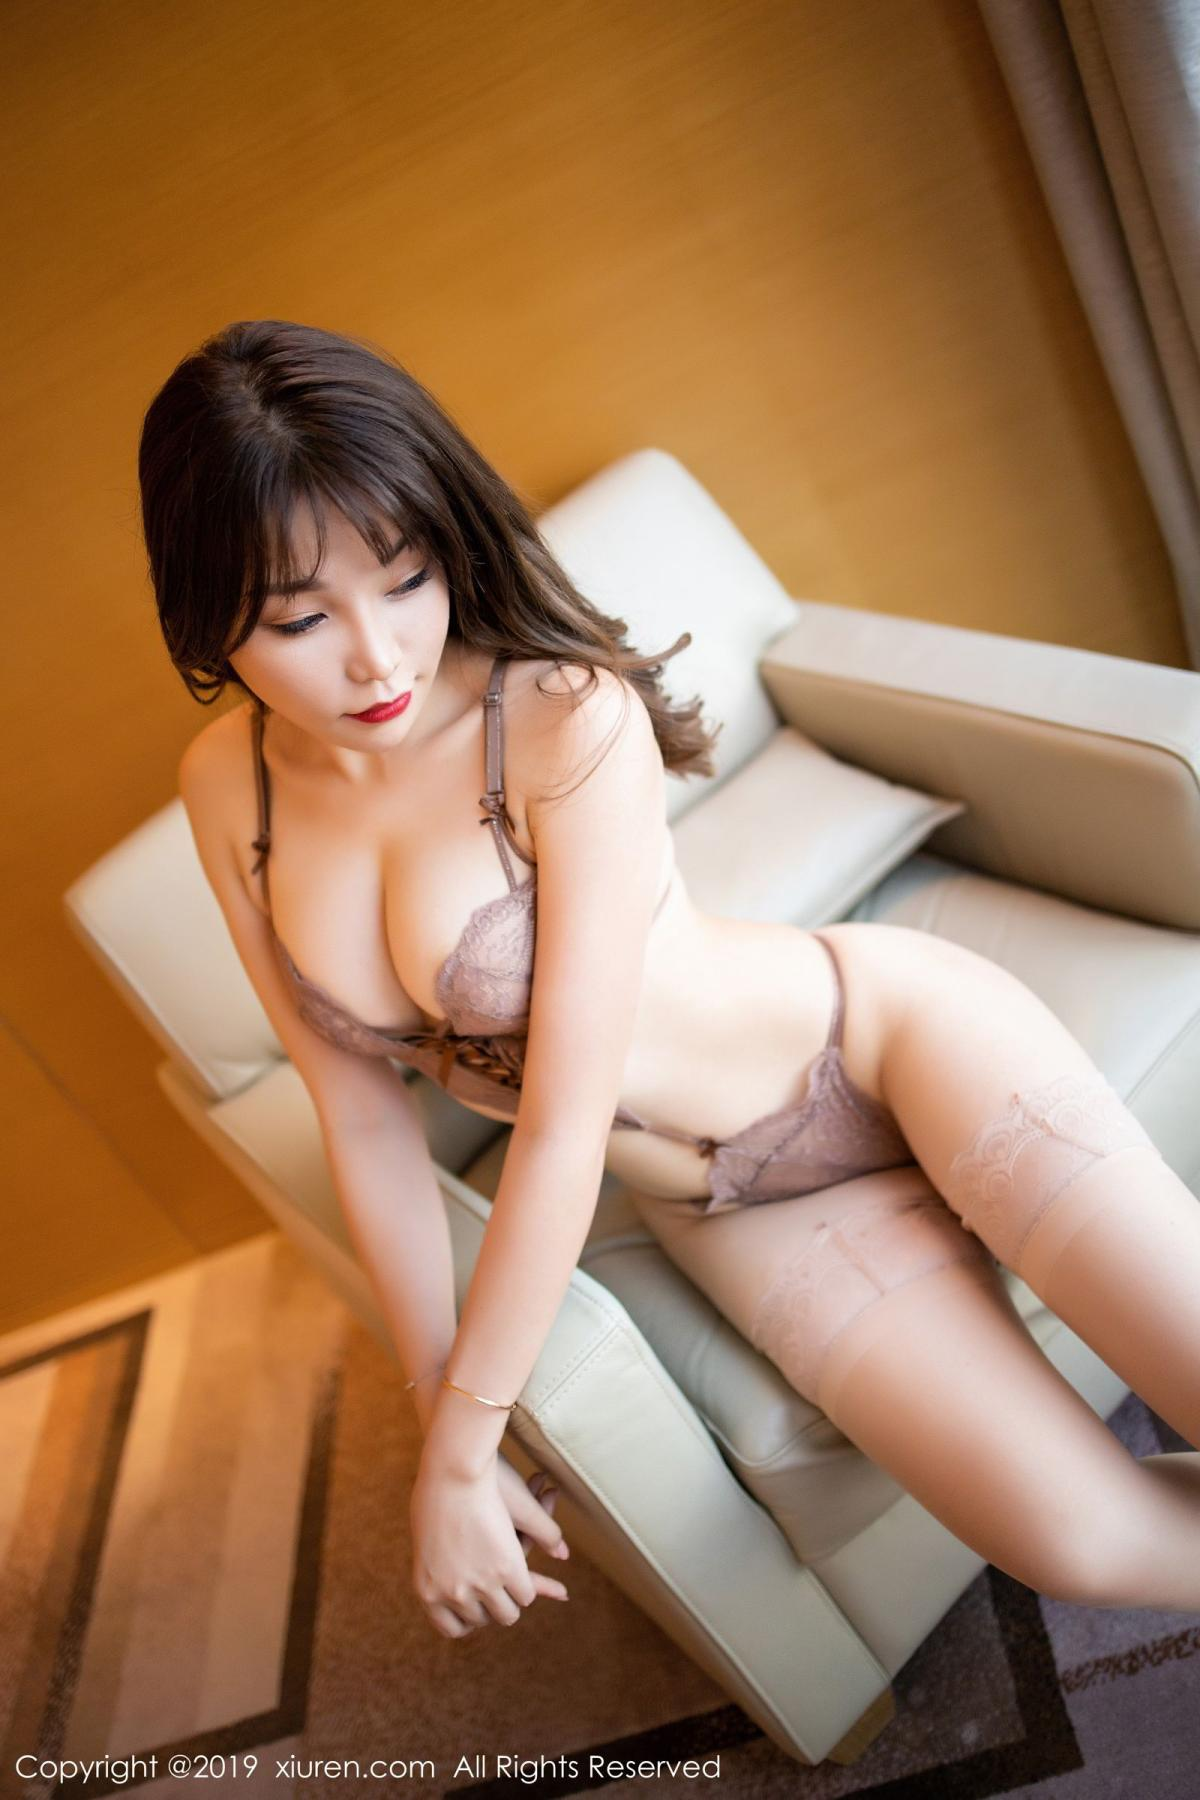 [XiuRen] Vol.1675 Chen Zhi 34P, Chen Zhi, Cheongsam, Tall, Underwear, Xiuren